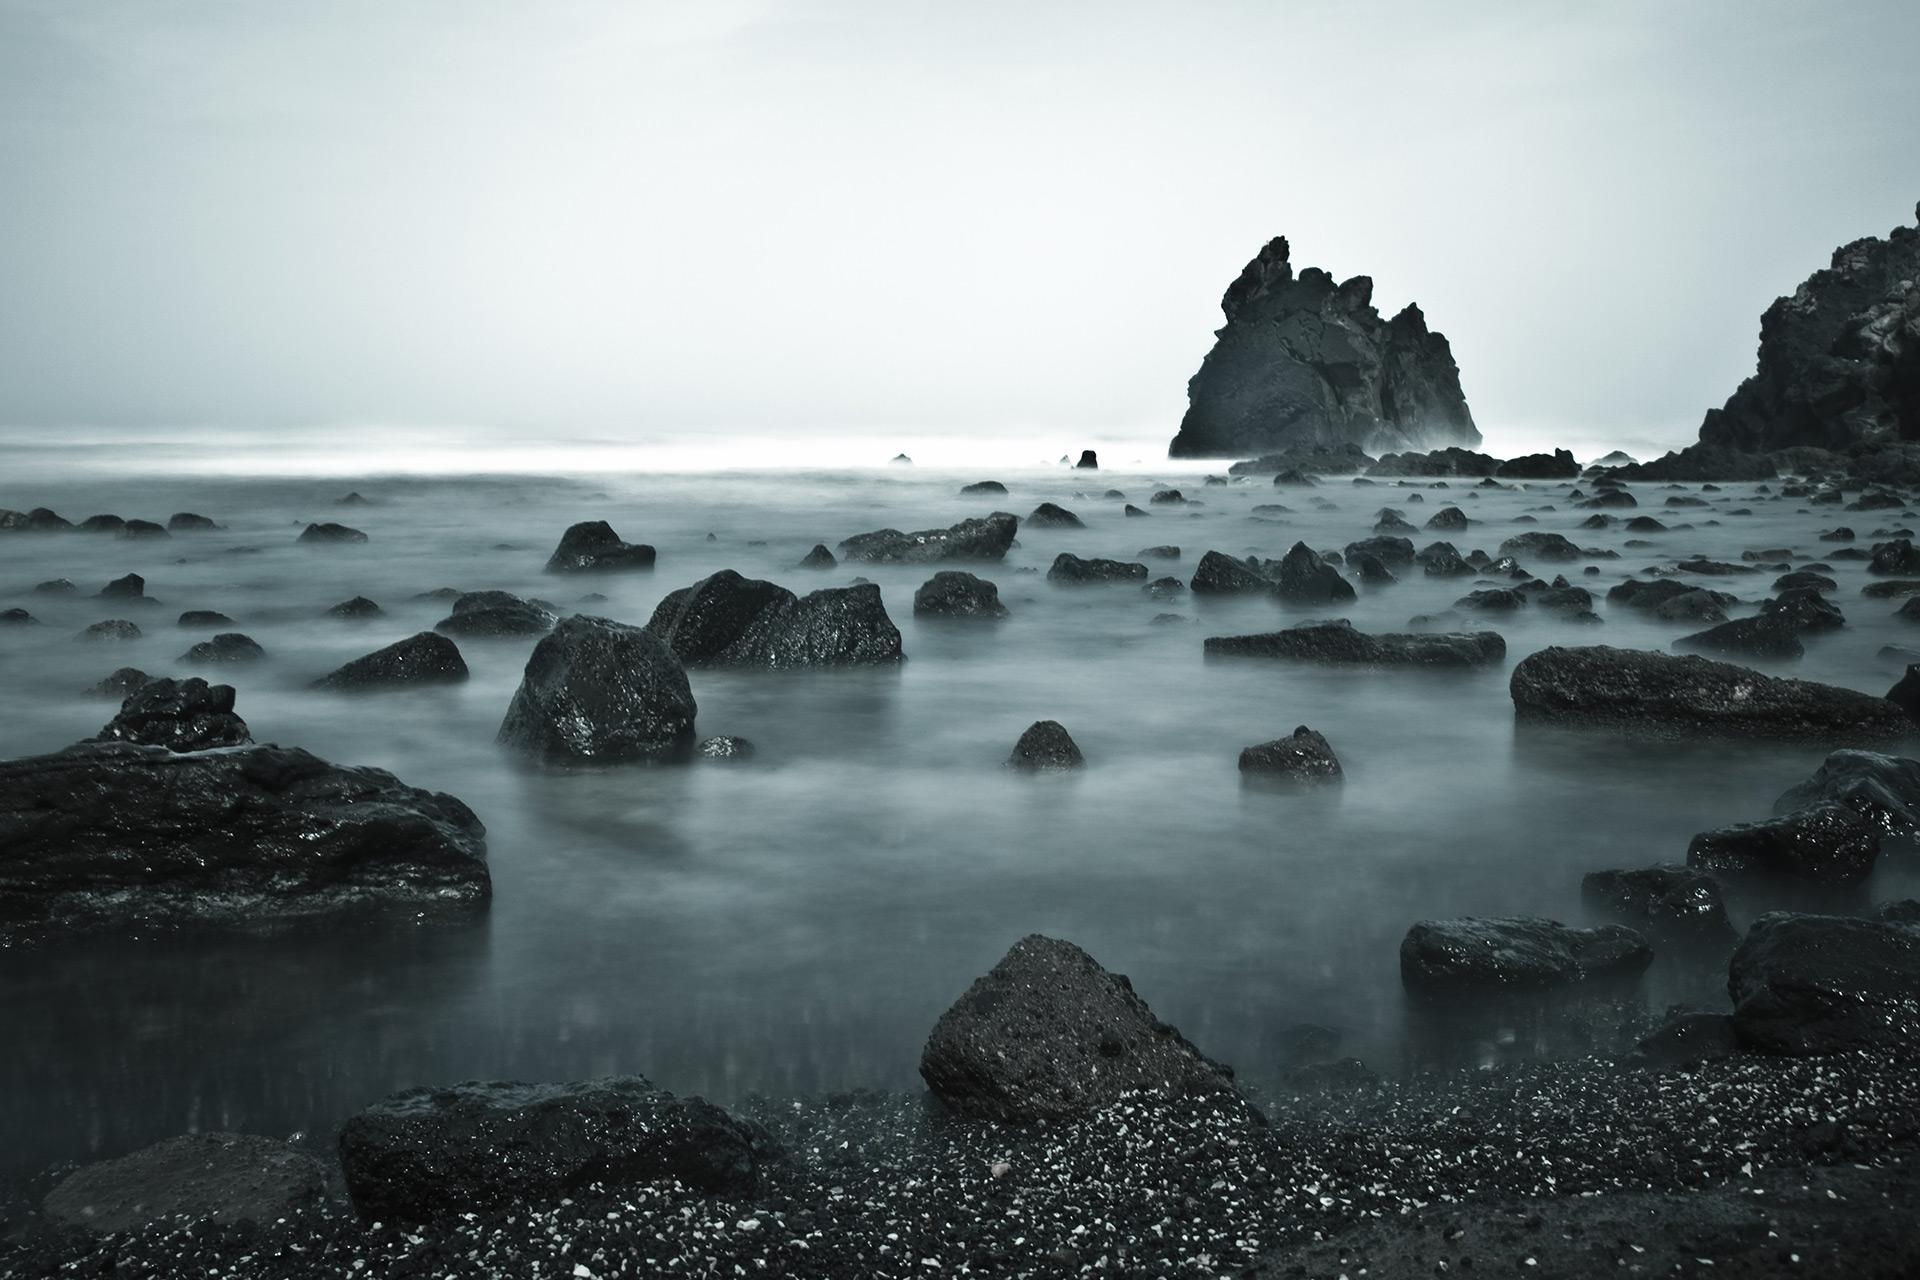 A Strange Environment - 2009 - Geoffrey Mitre Photographie